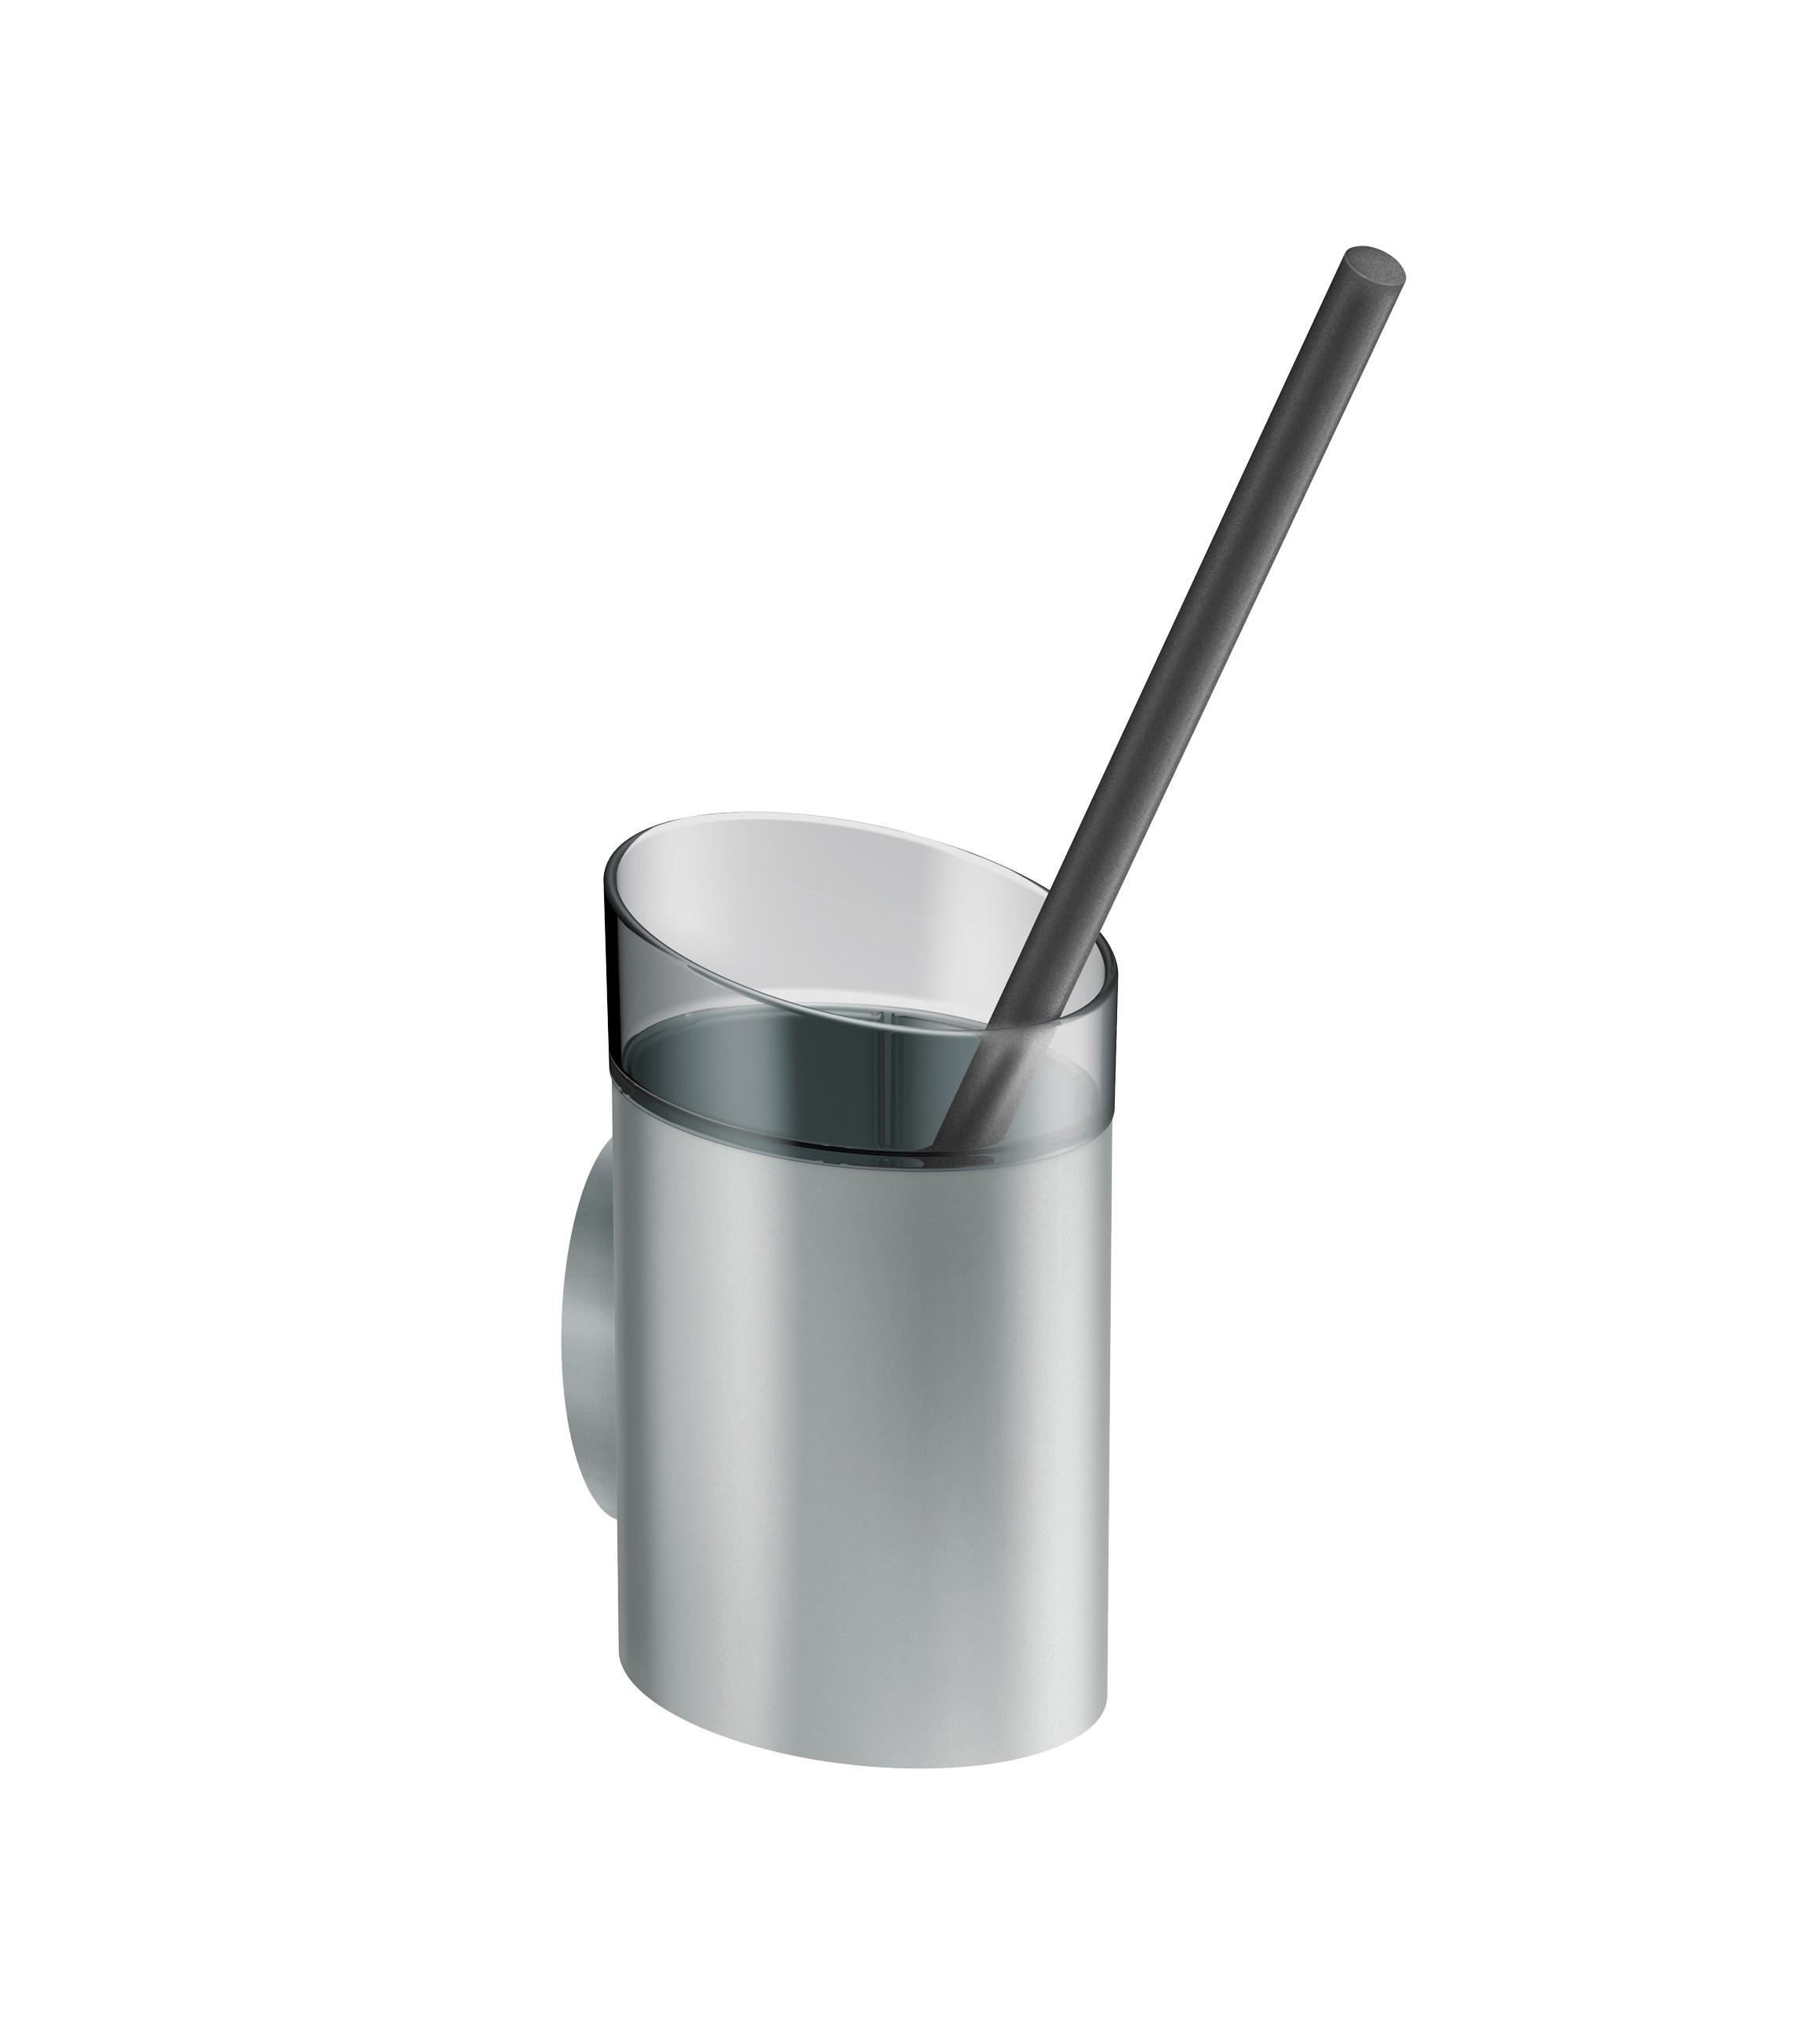 FSB WC-Bürstengarnitur A100 Anthrazitgrau metallinksc (0 82 8460 00008 8809)